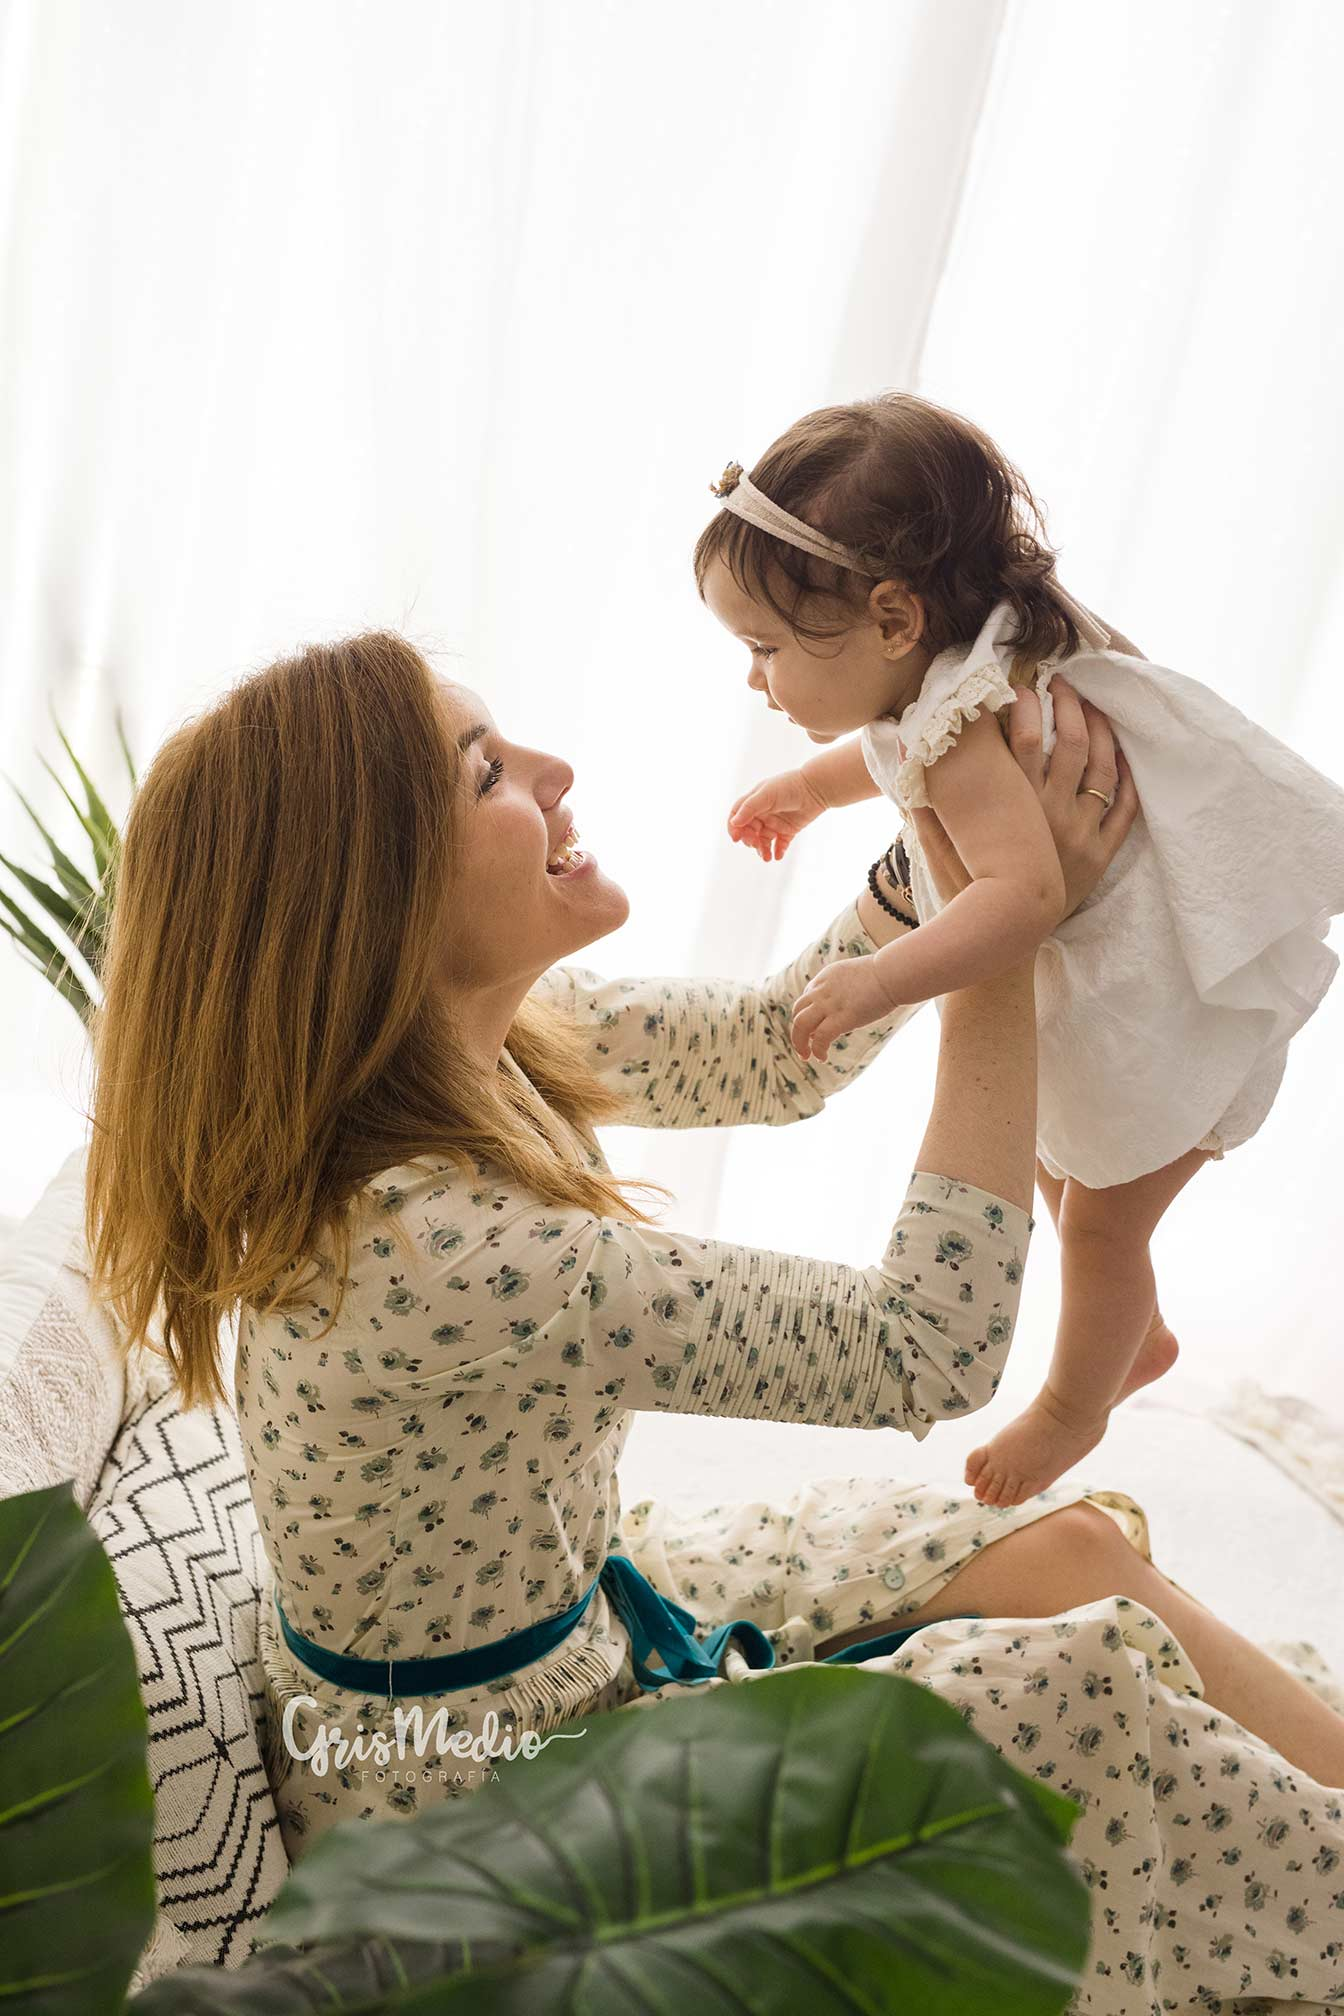 fotografia-familia-infantil-zaragoza-grismedio-bebe-lactancia19